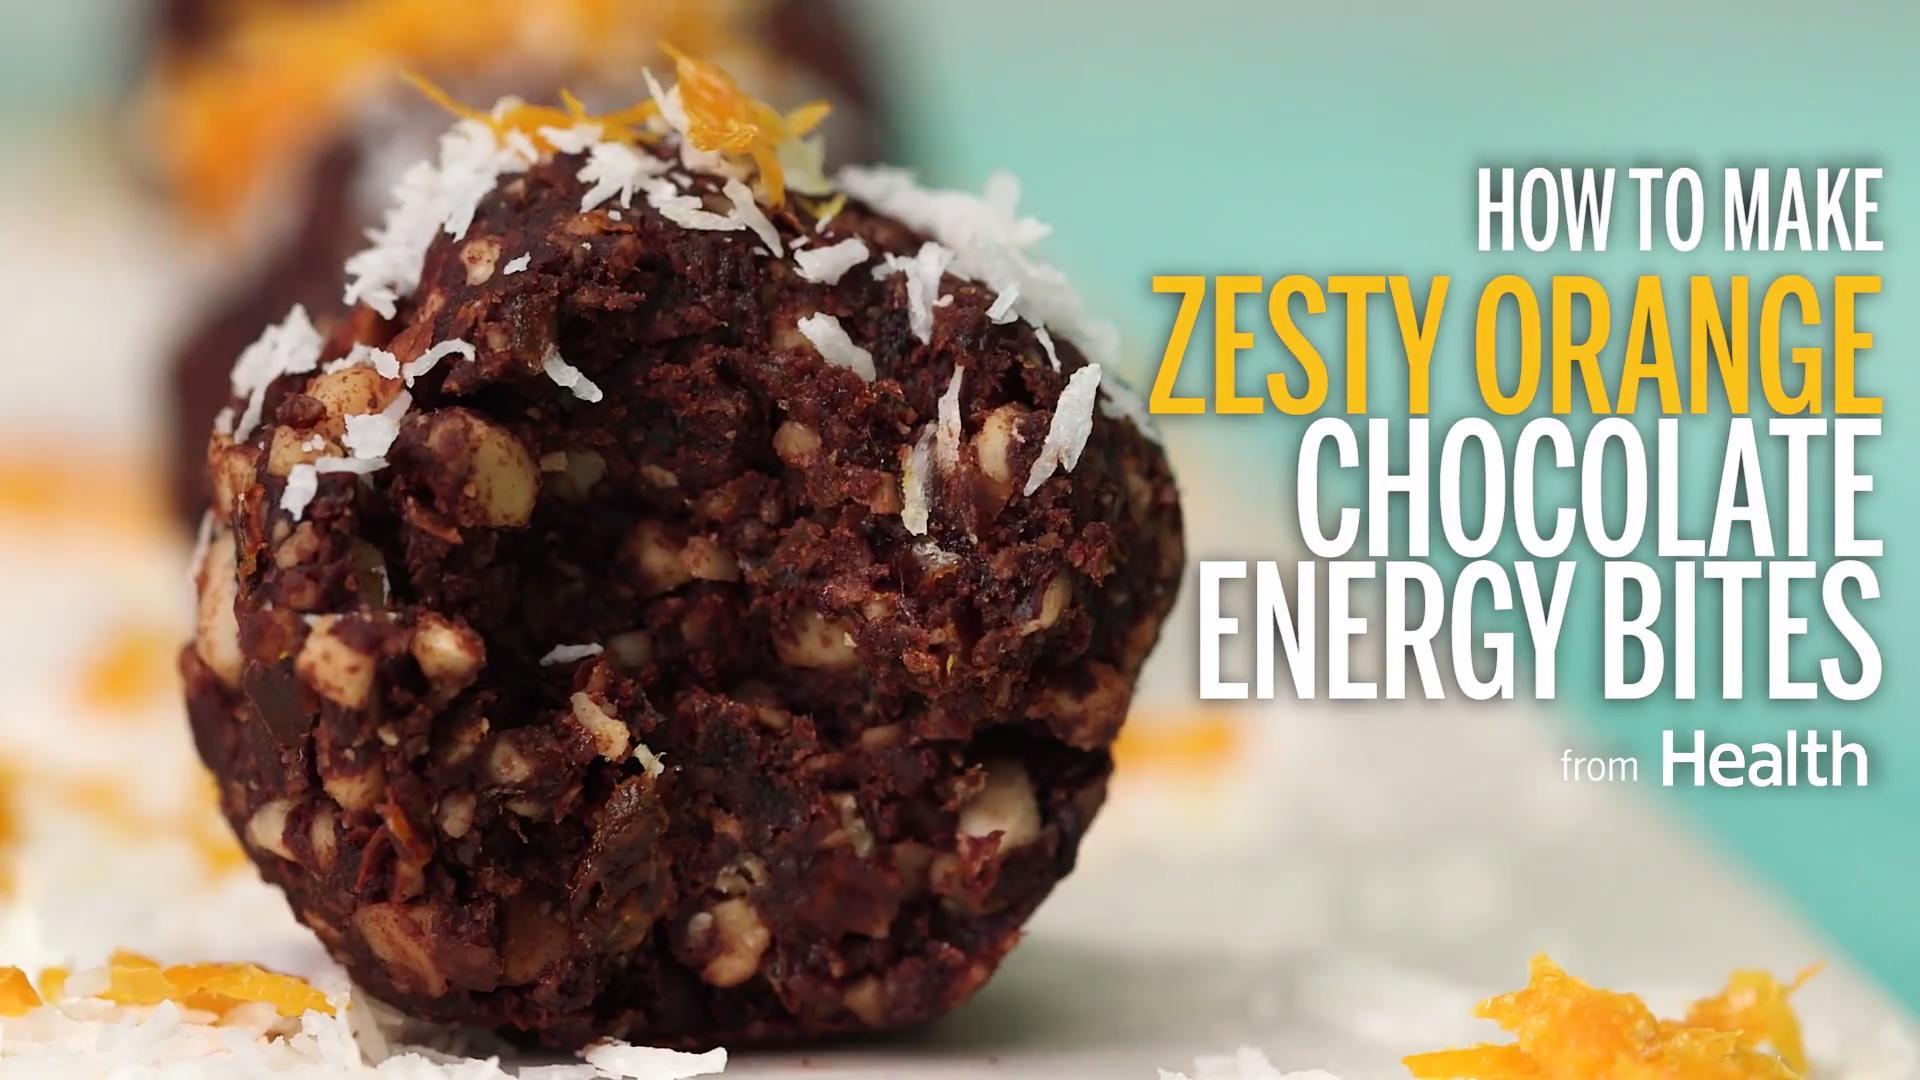 Zesty Orange Chocolate Energy Bars